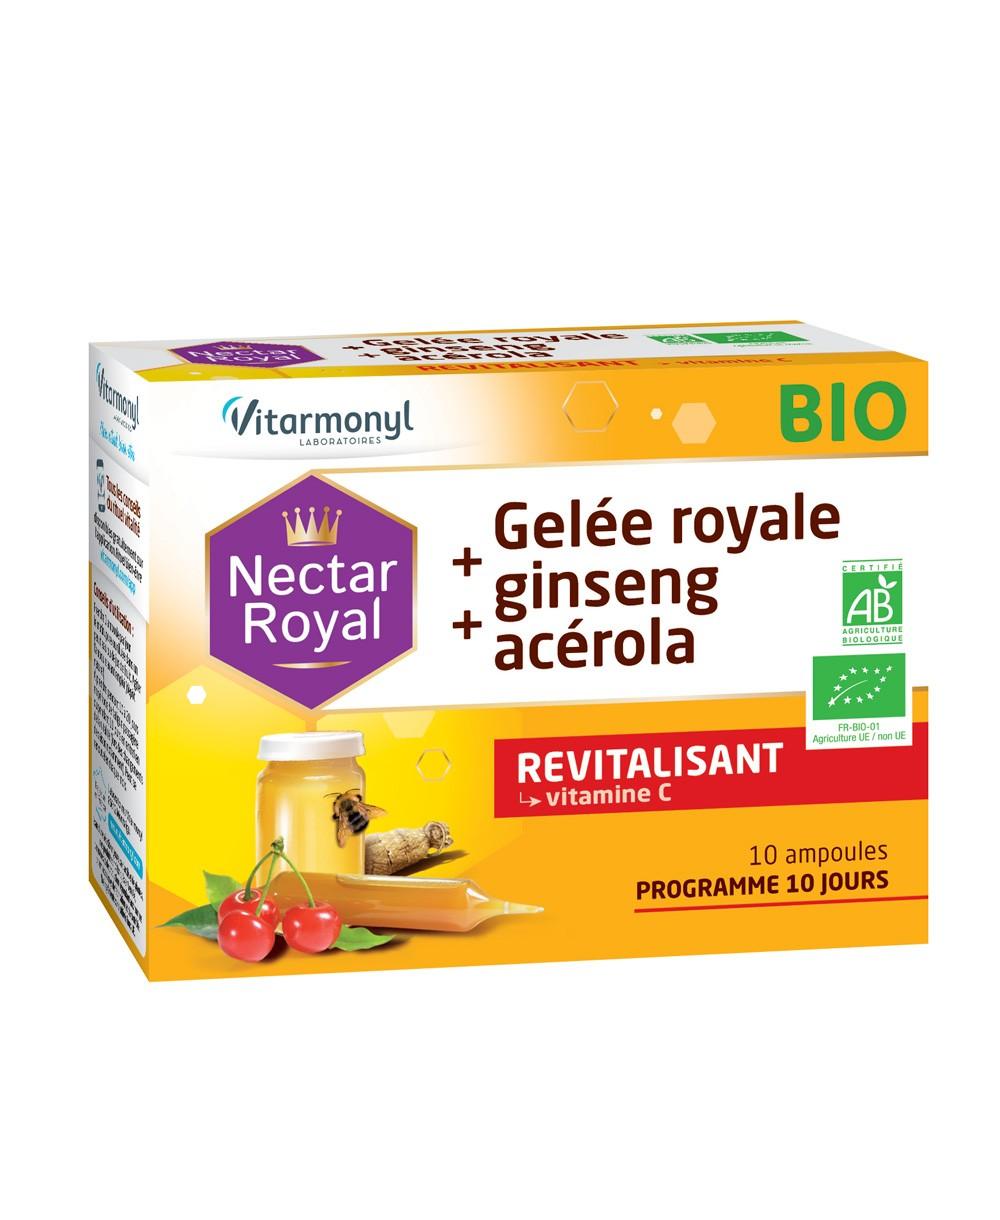 Image Gelée royale + ginseng + acérola BIO